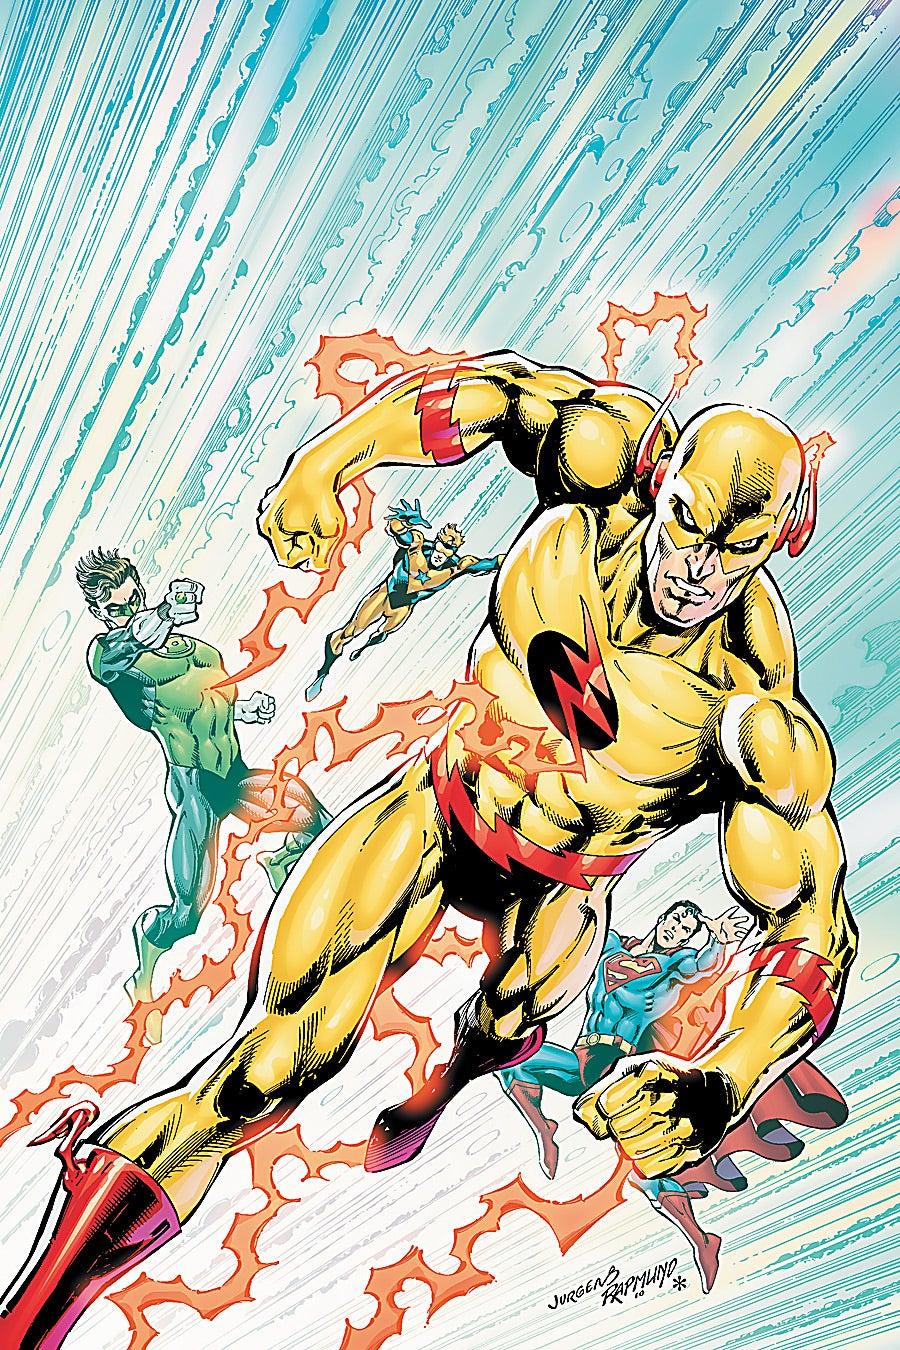 reverse flash vs professor - photo #34